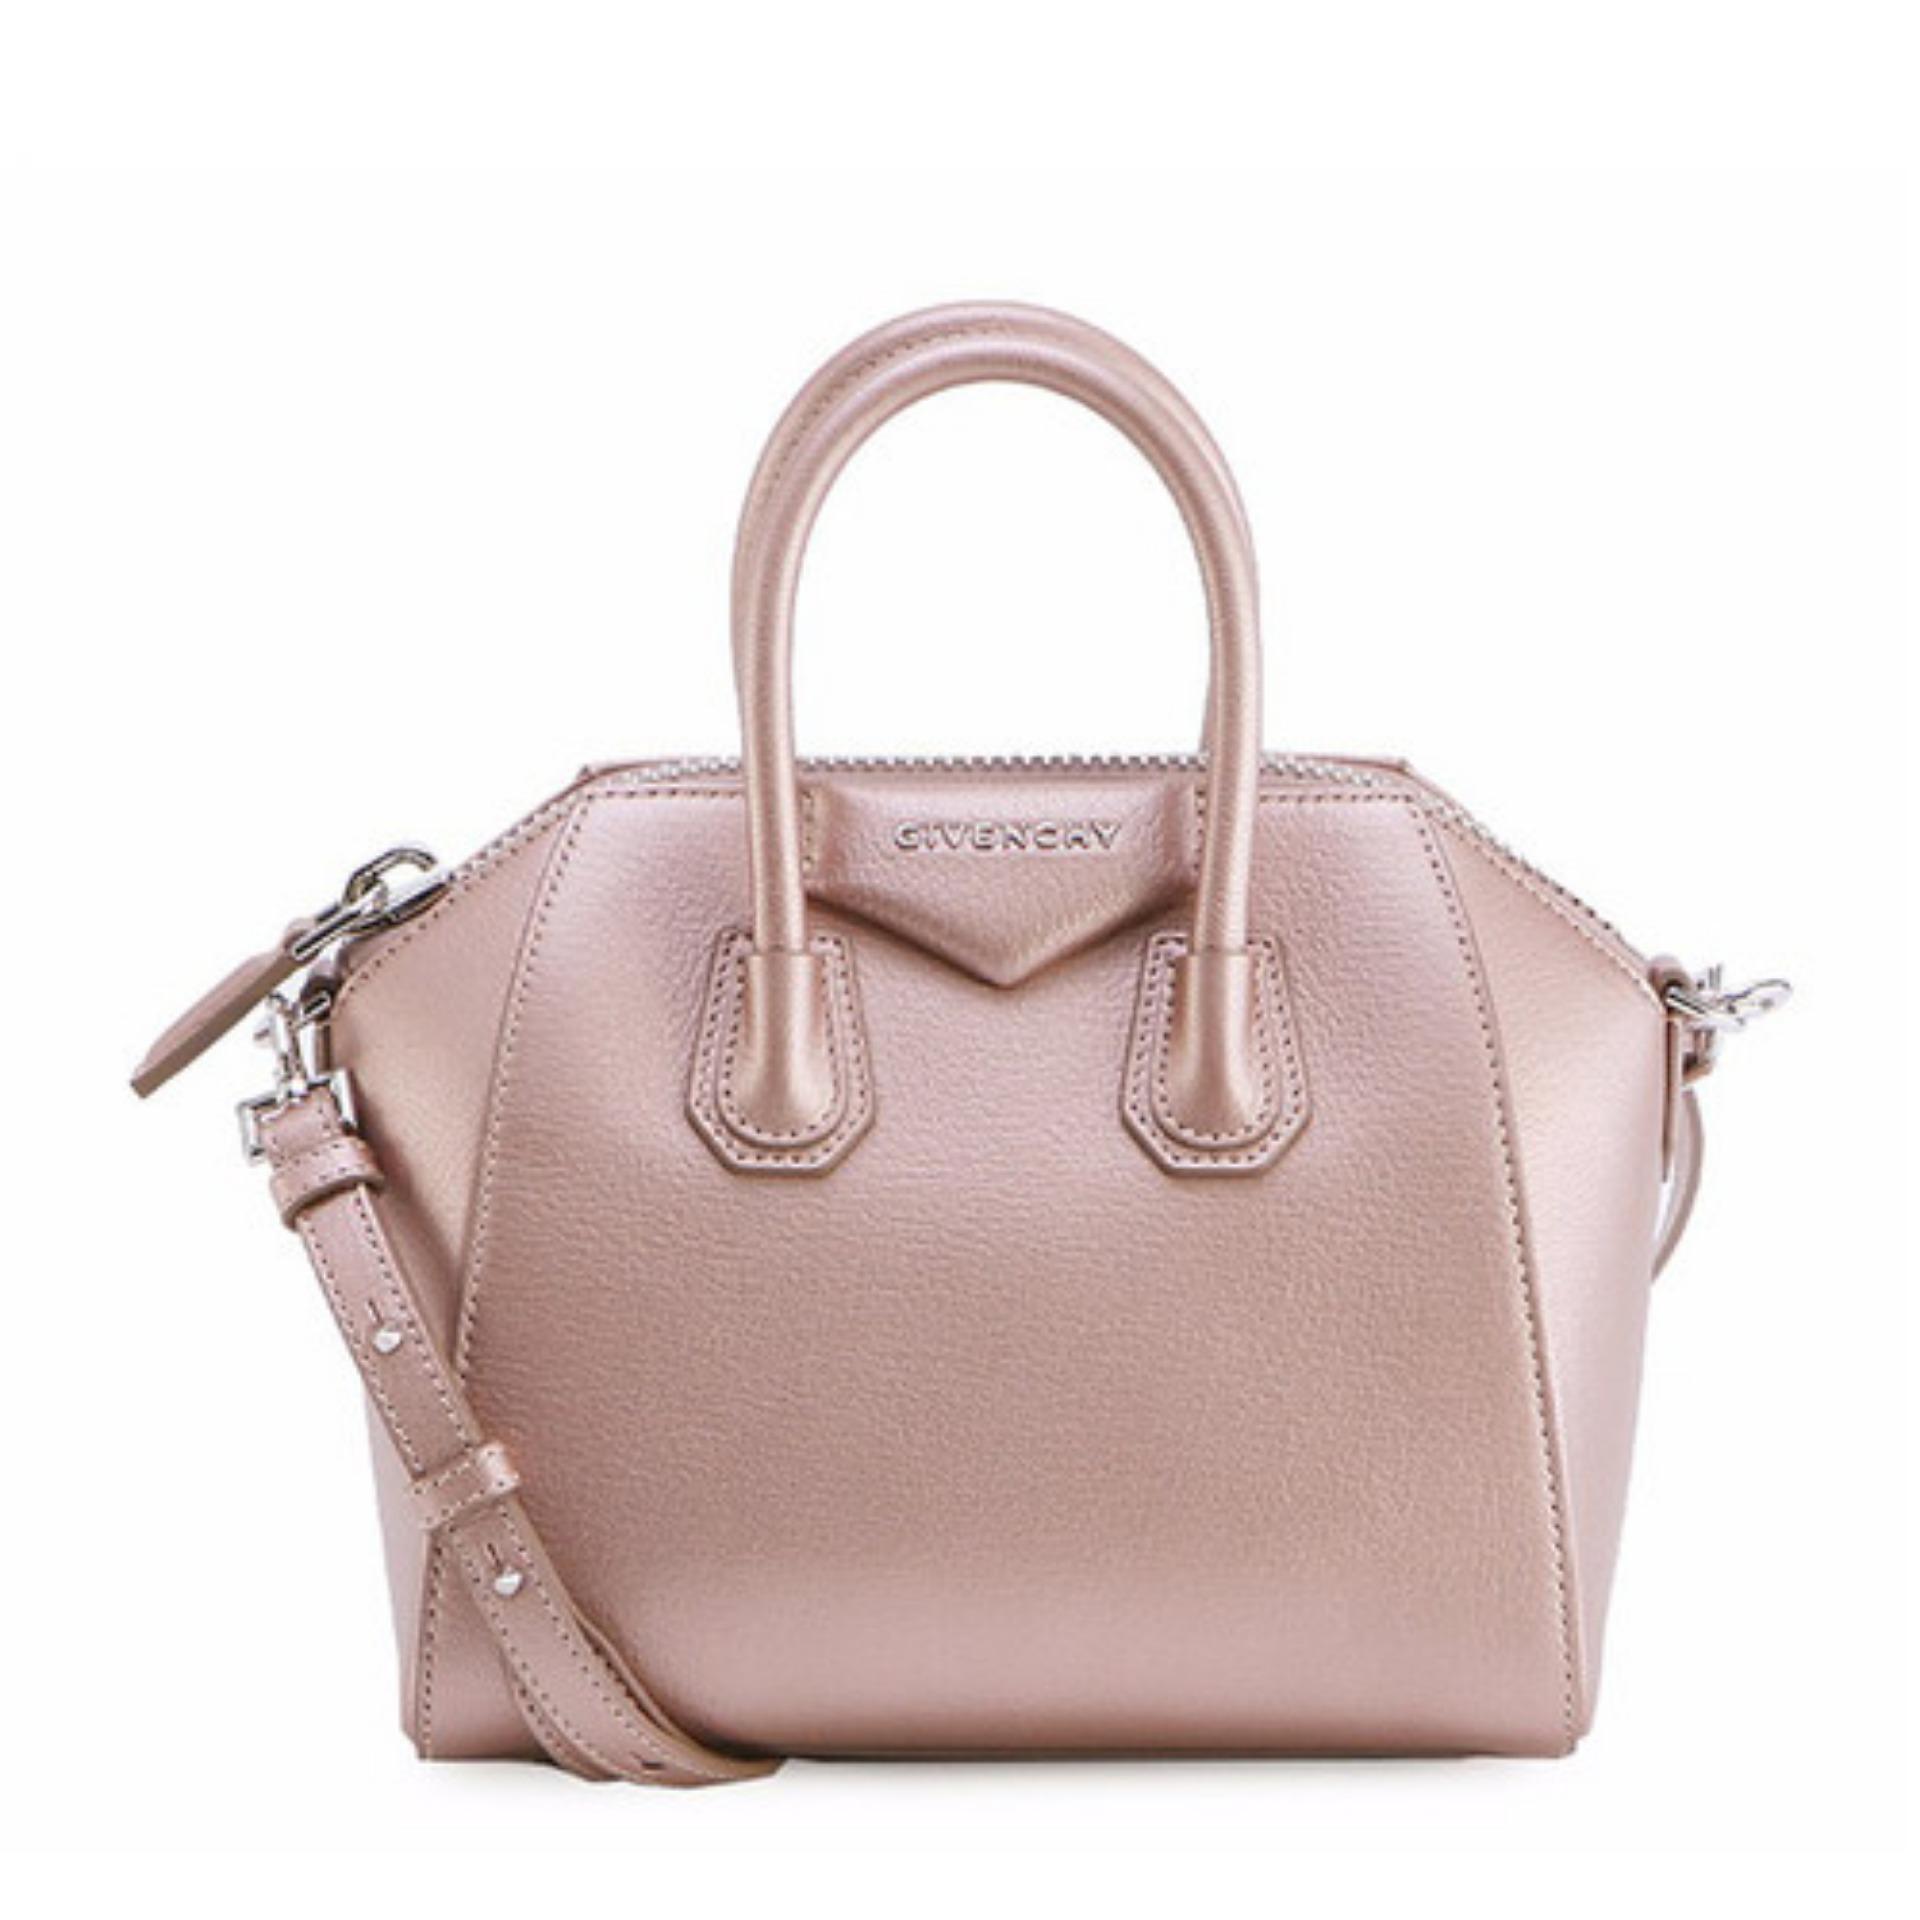 8004e132e648 Givenchy Mini Antigona Bag (Rose Gold)   BB05114450681